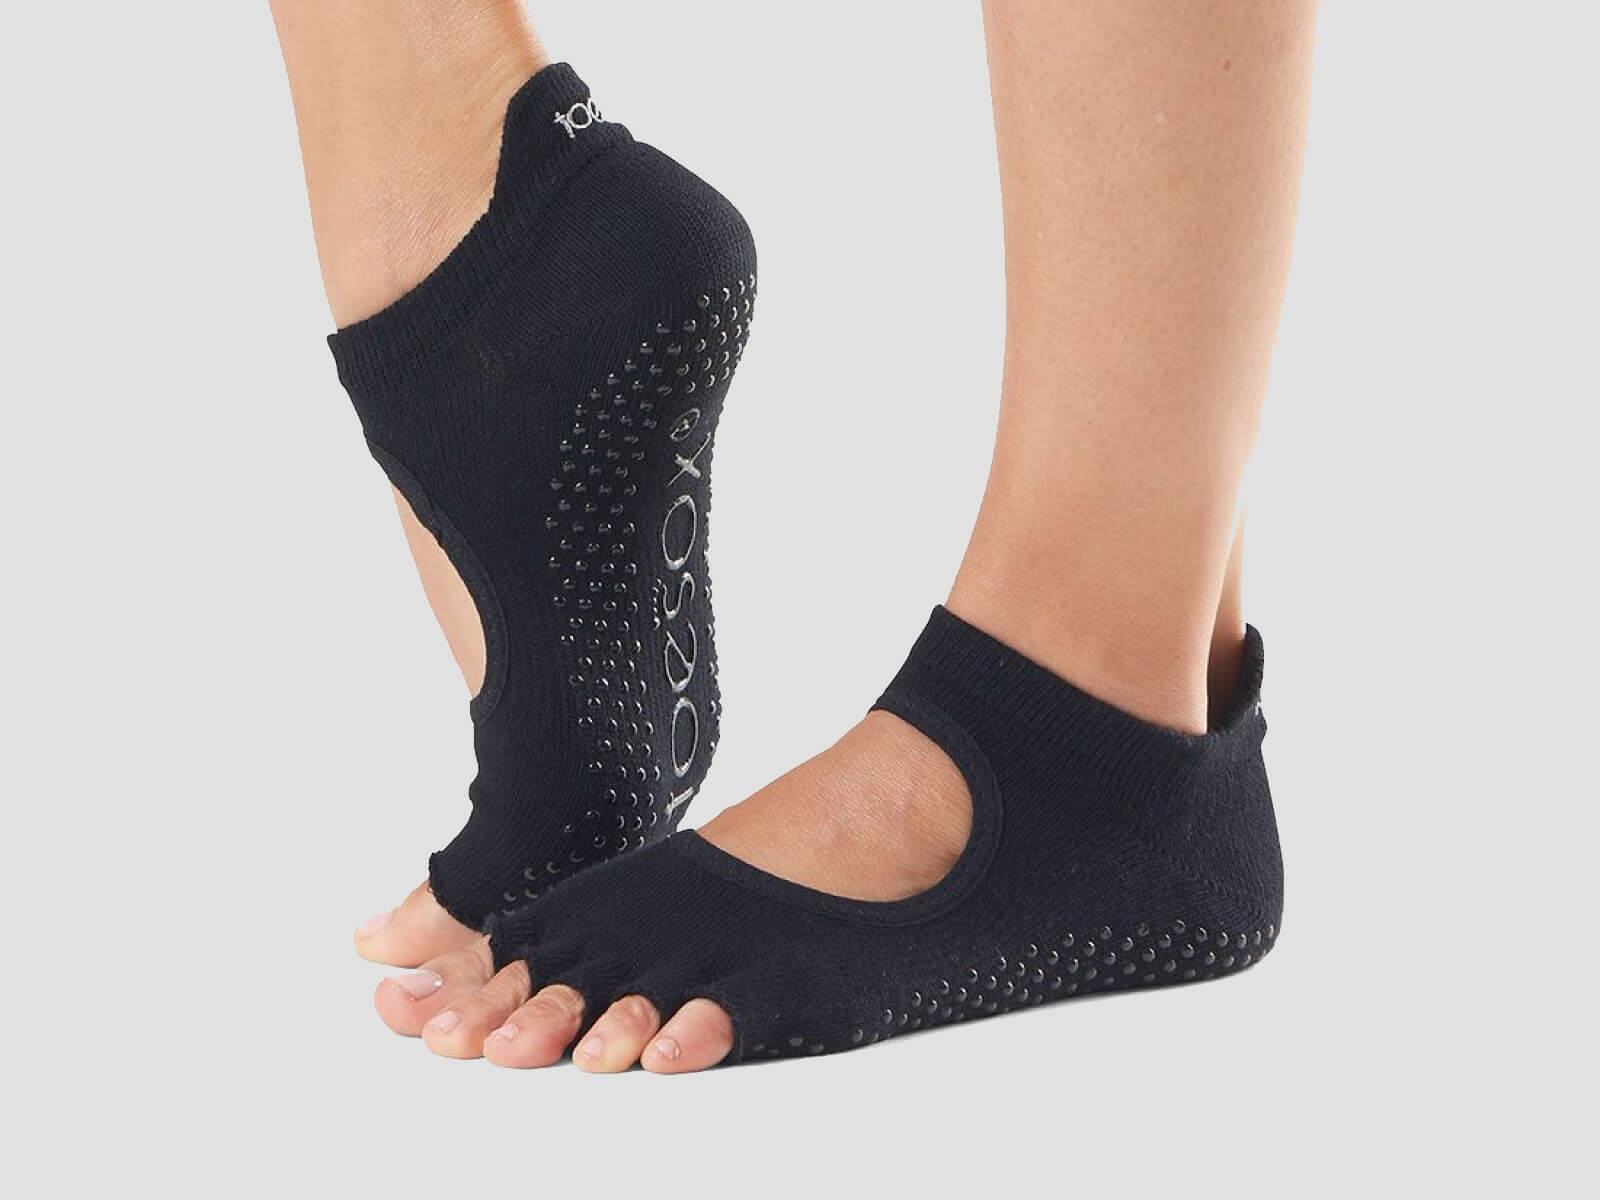 ToeSox Bellarina open toed socks for dance and yoga.